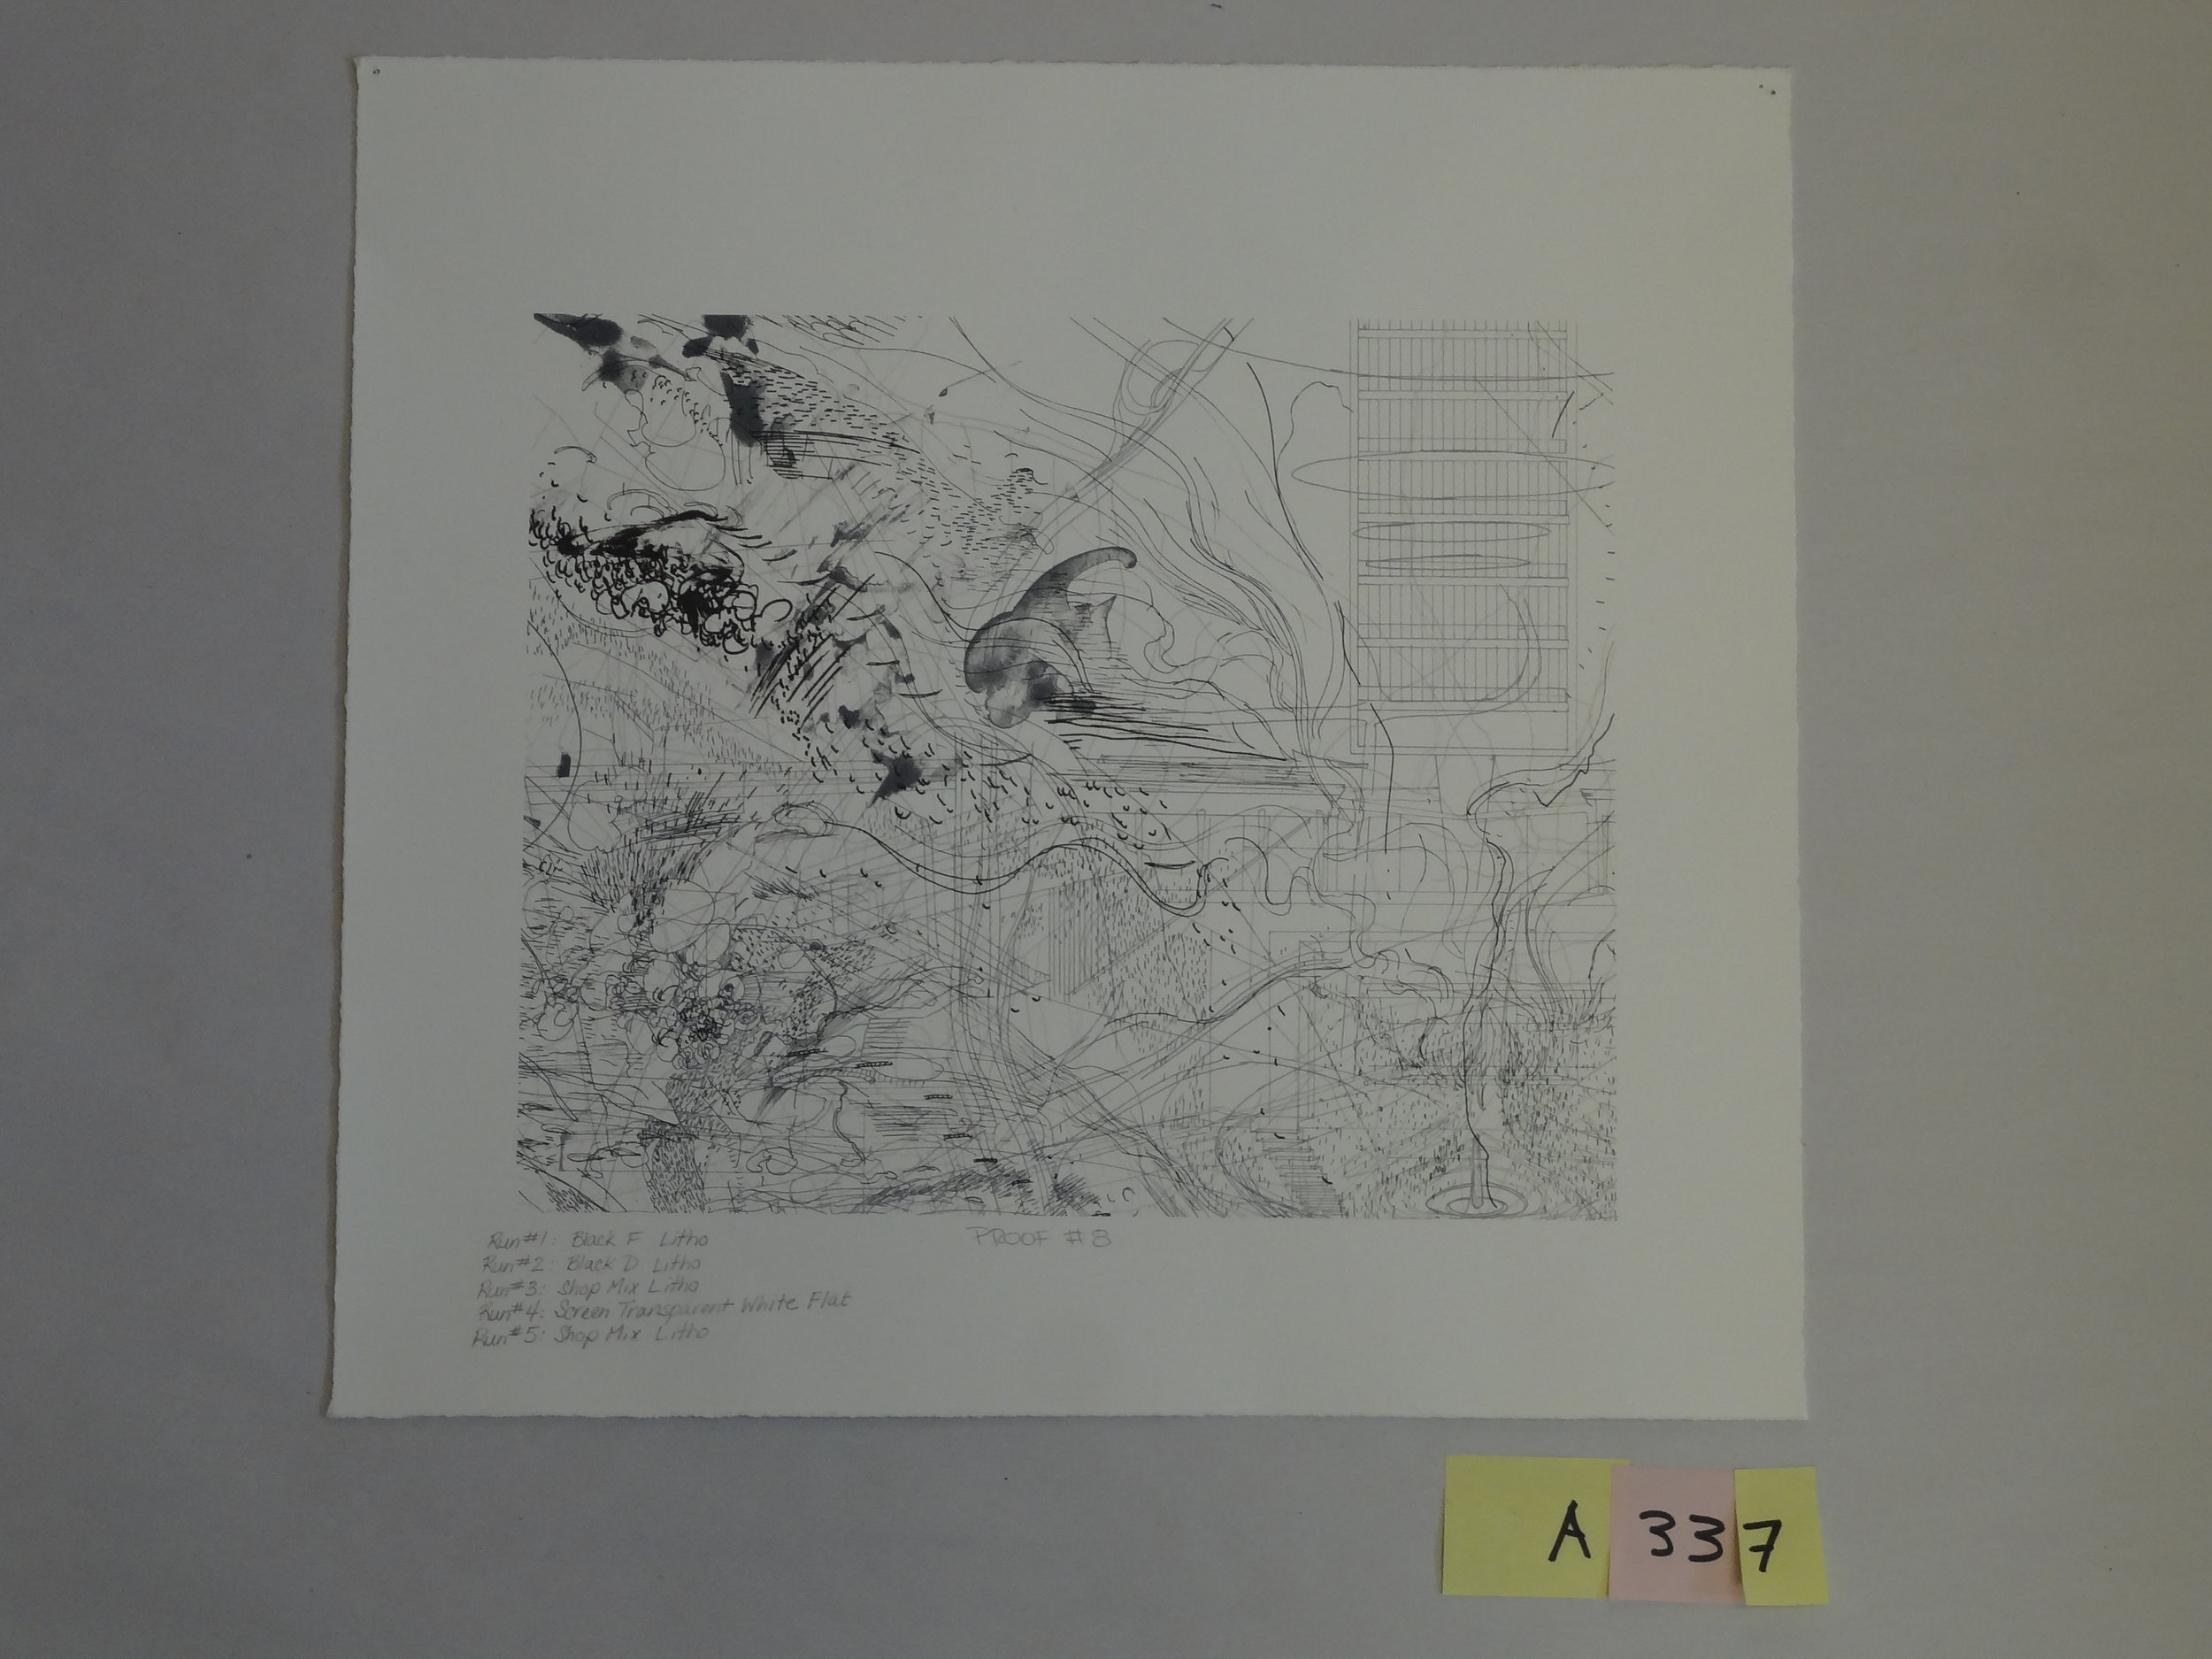 A337.JPG